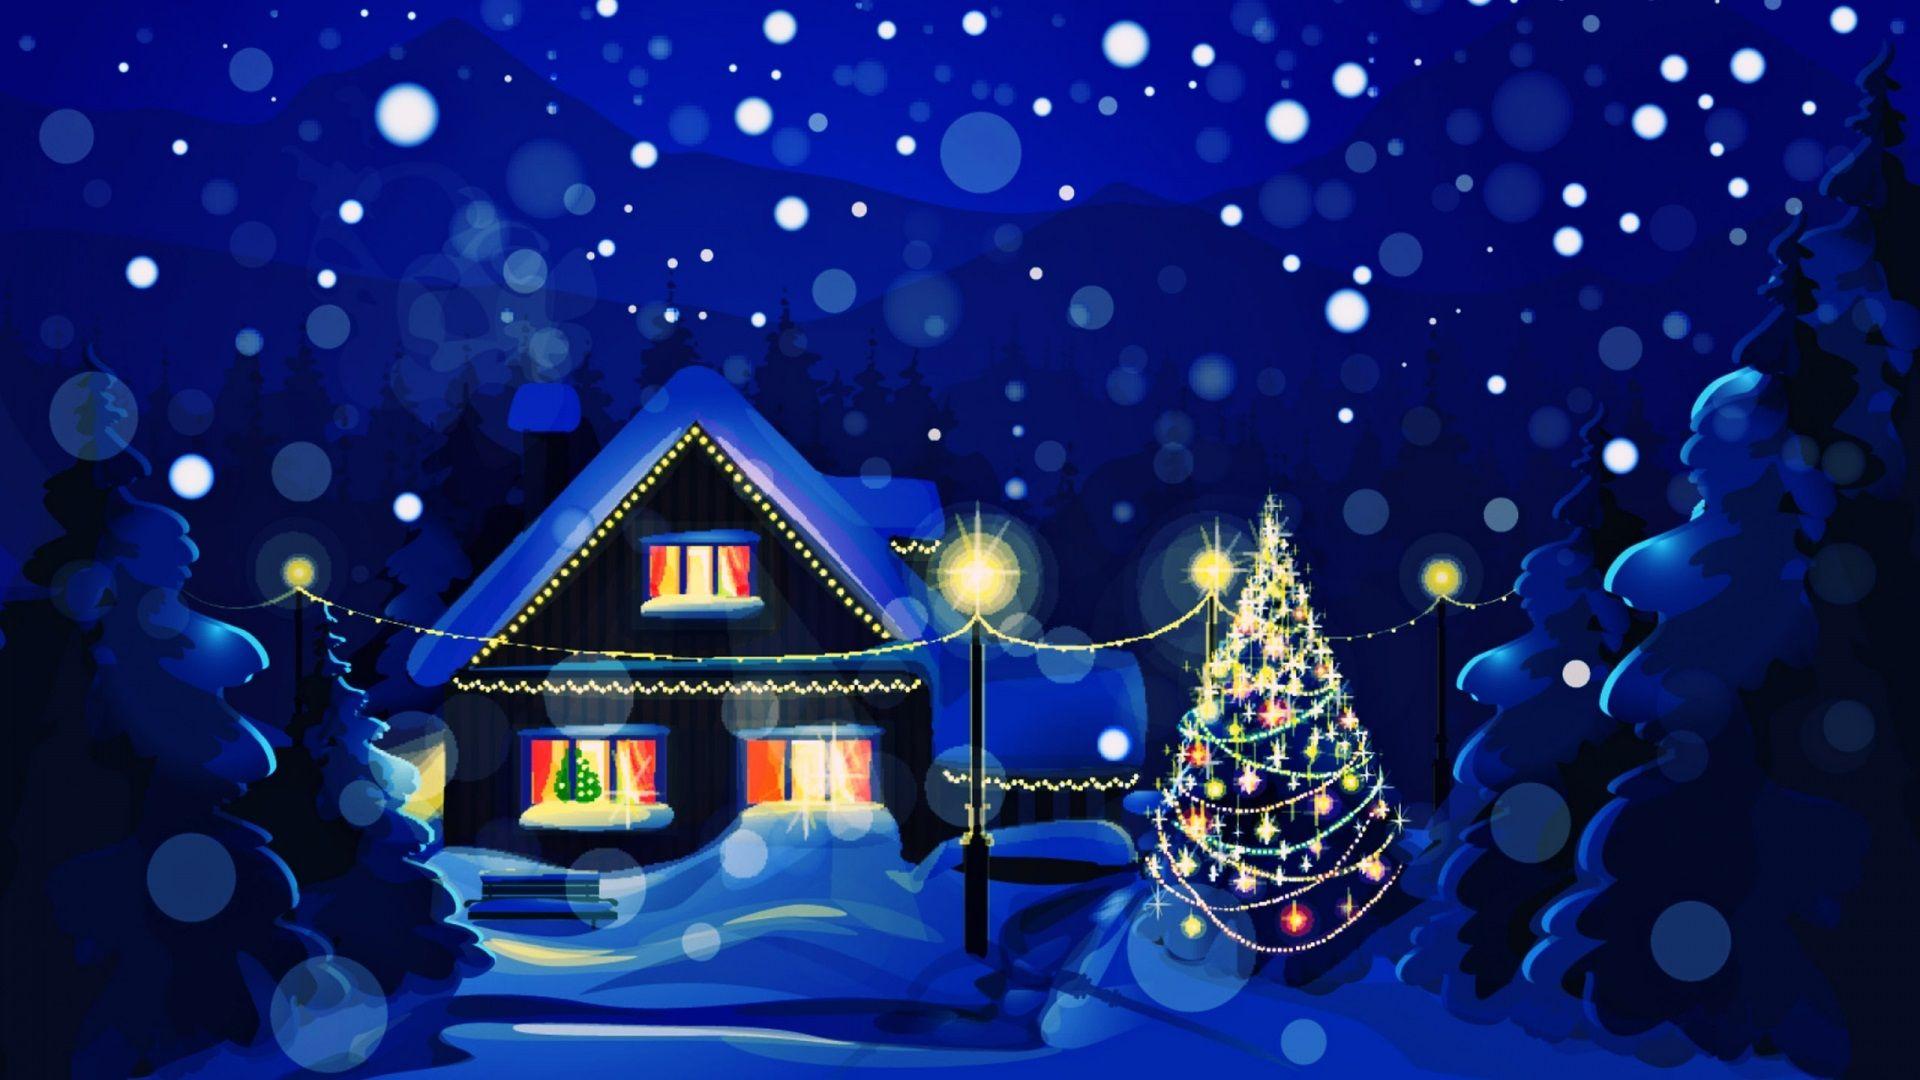 High Definition Christmas Screensavers Wallpaper Natal Papel De Parede Natalino Arvore De Papel De Parede